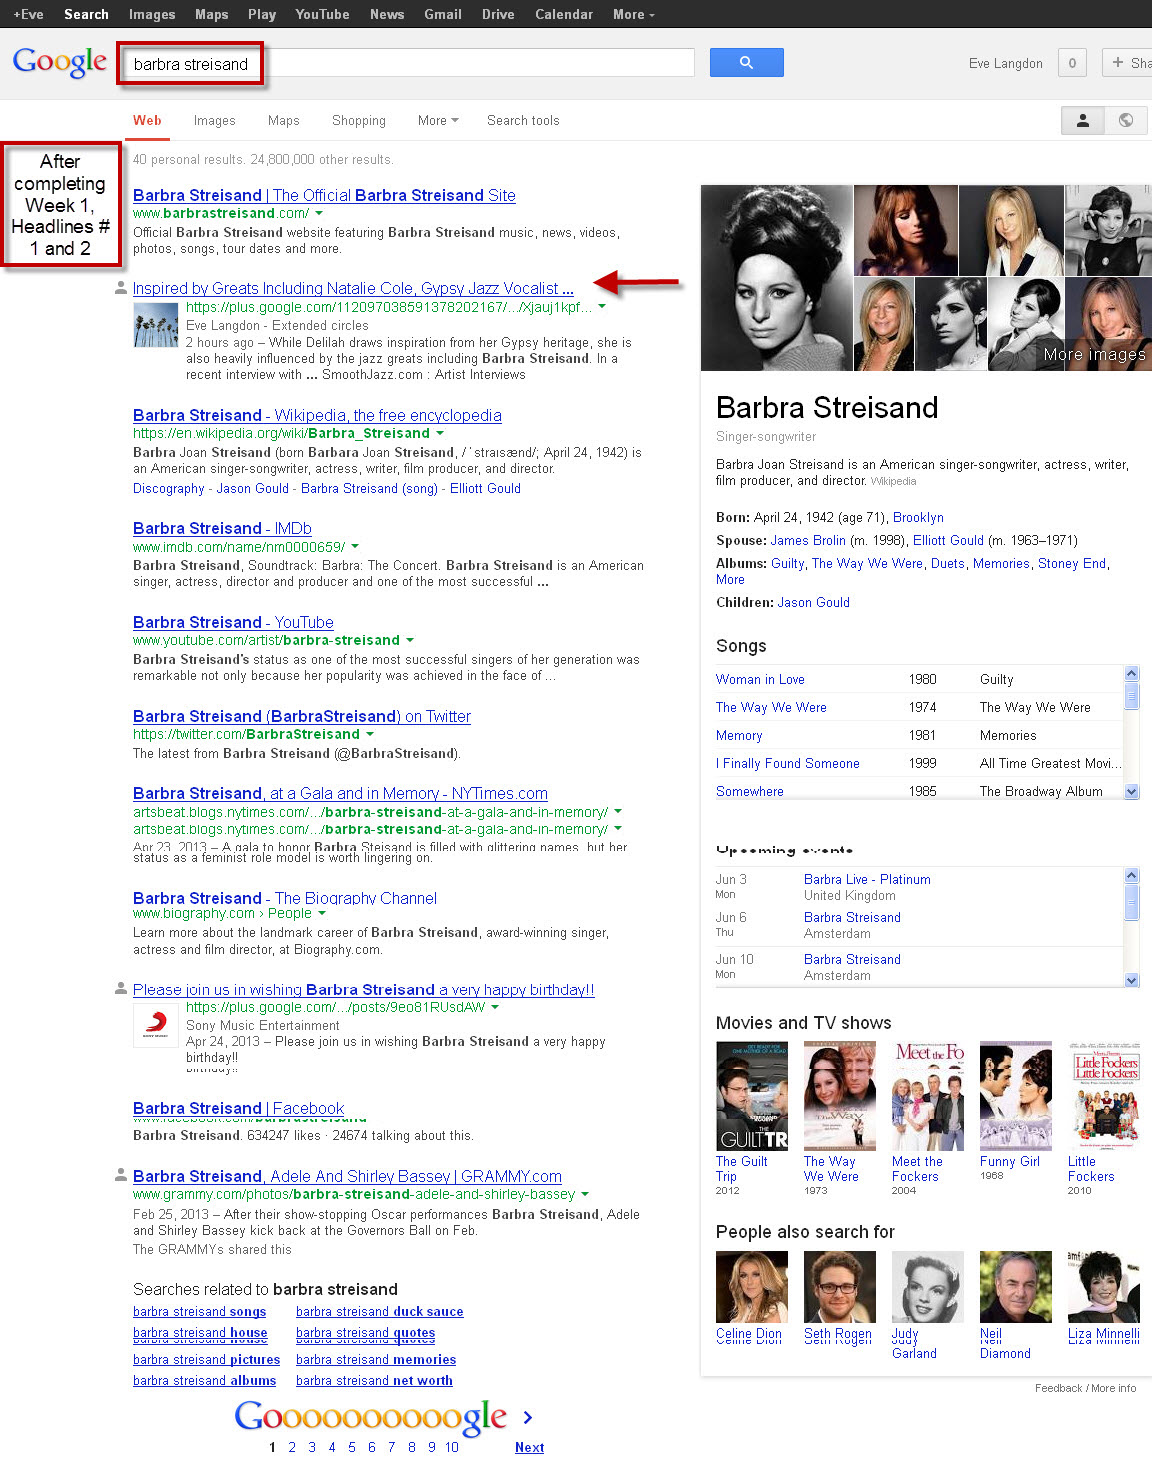 Barbra Streisand Google search #2